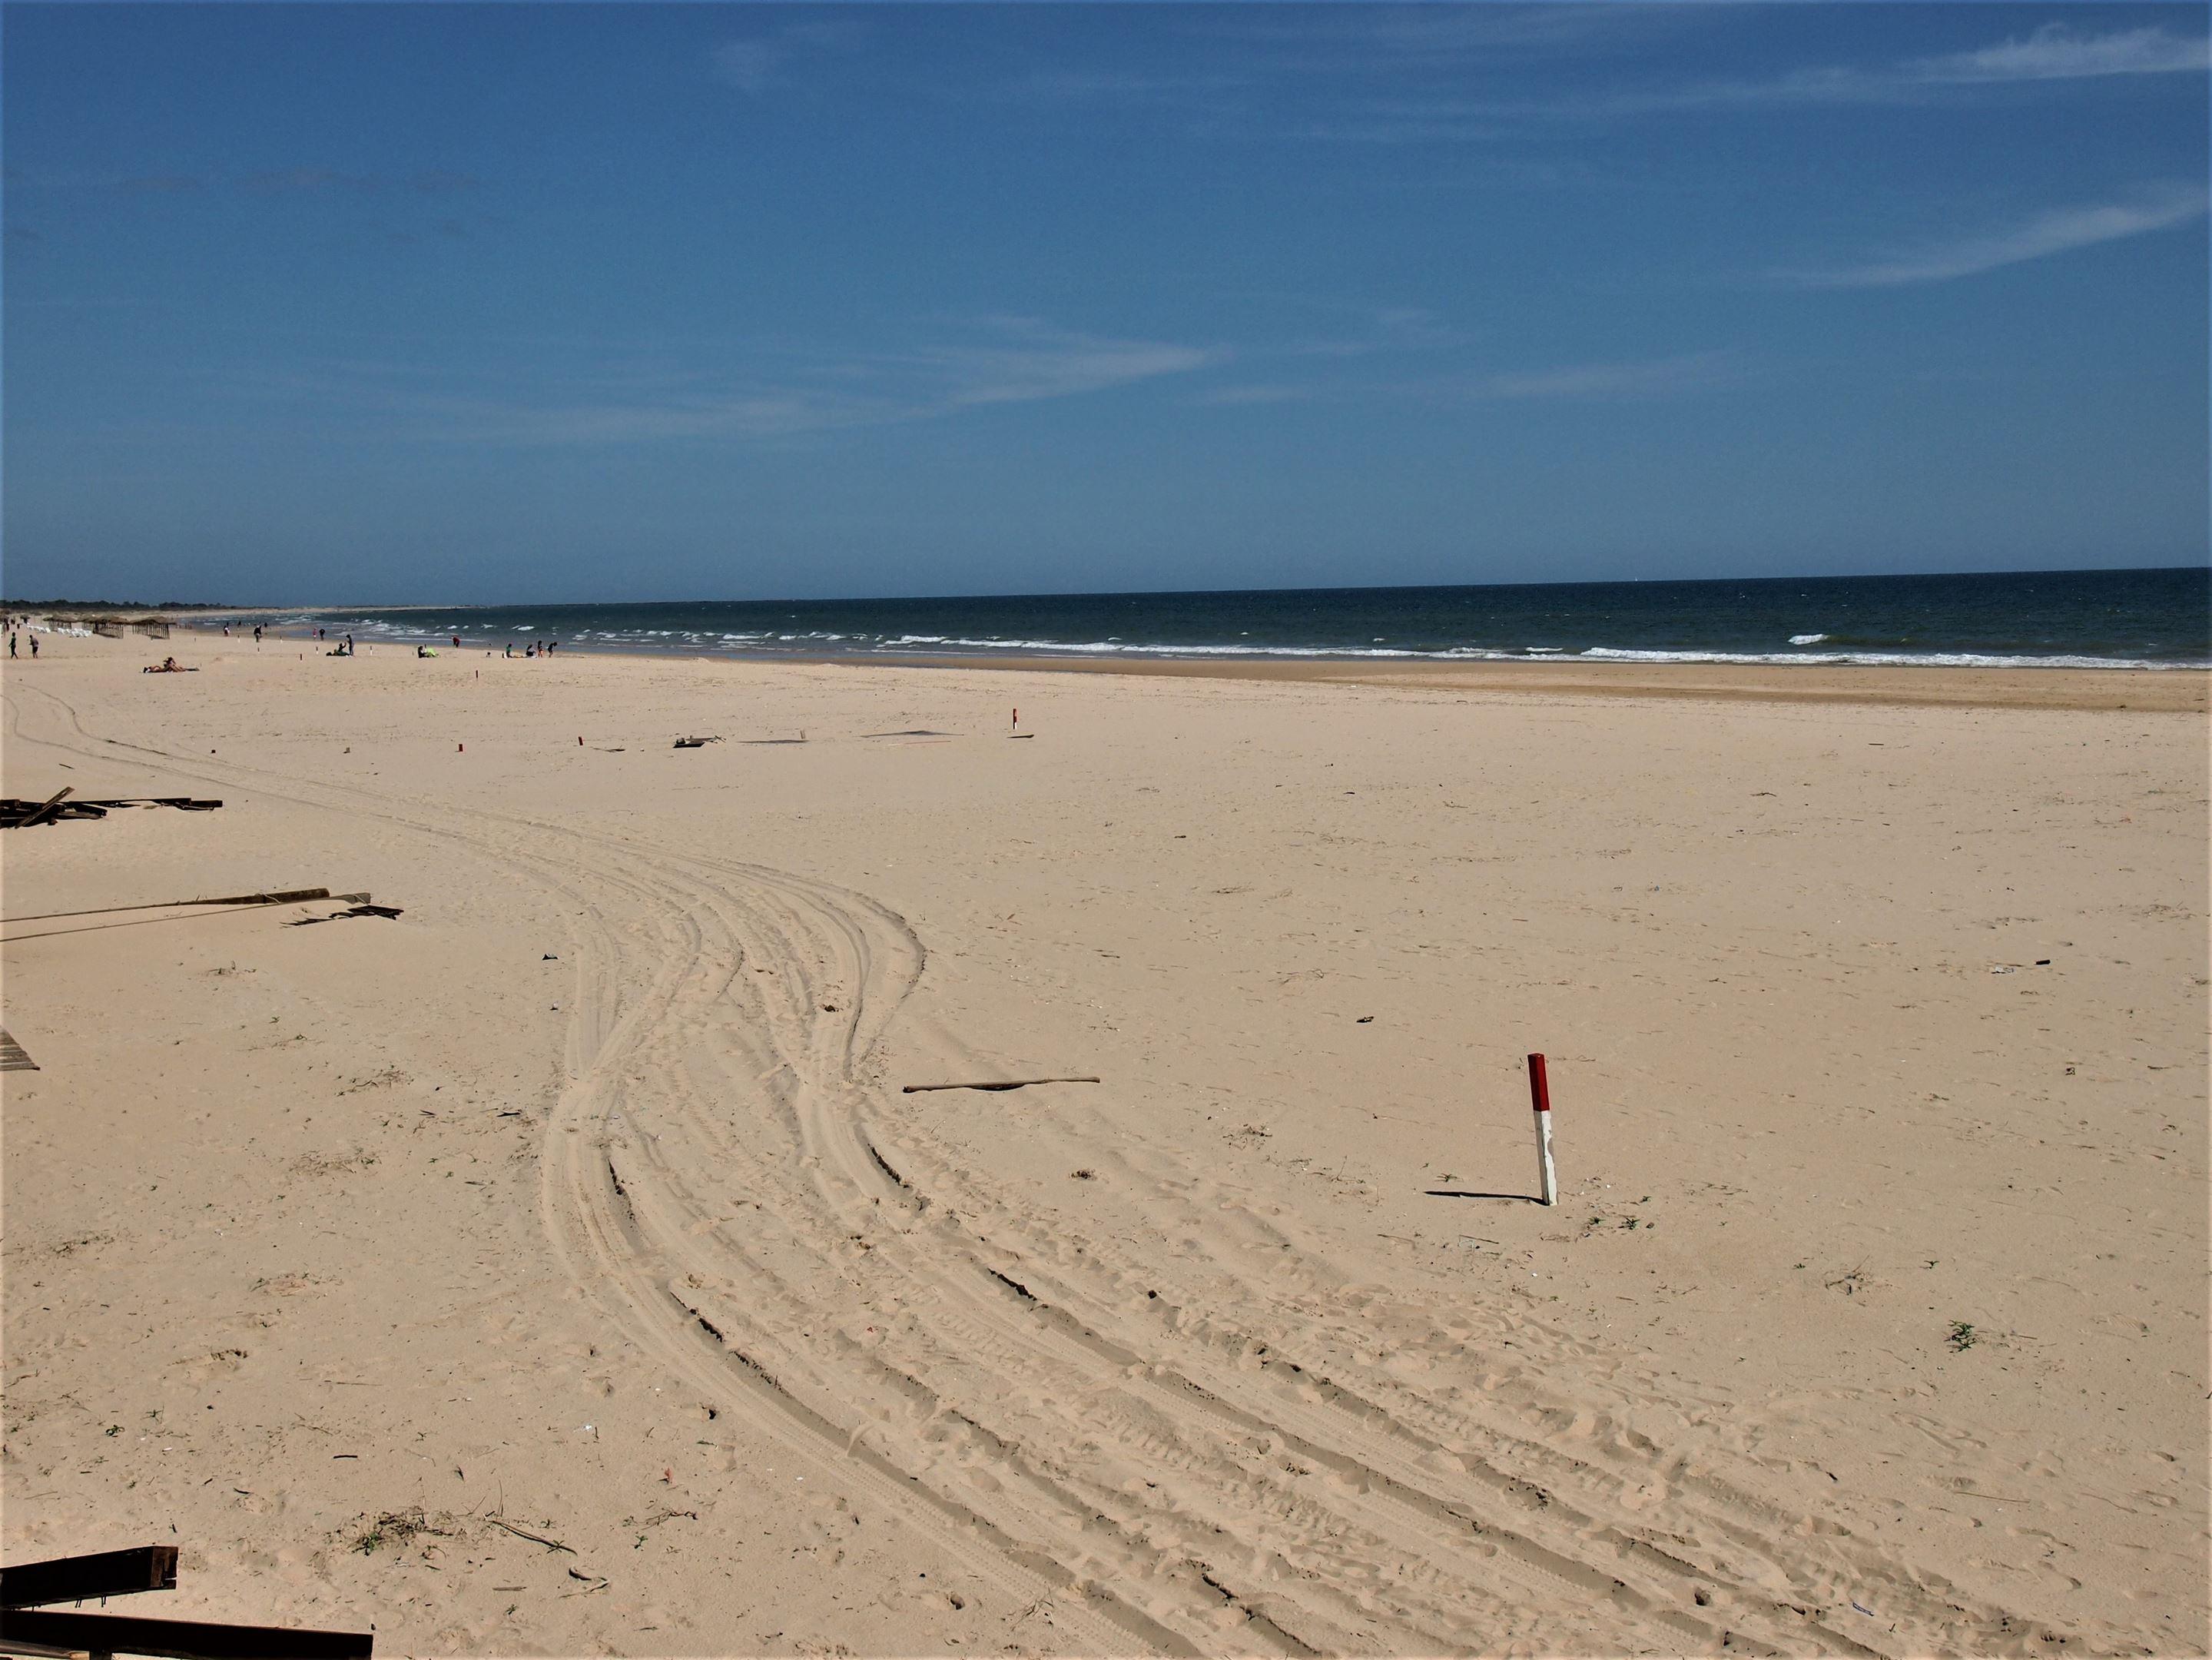 Praia de Monte Gordo, looking east towards Spain